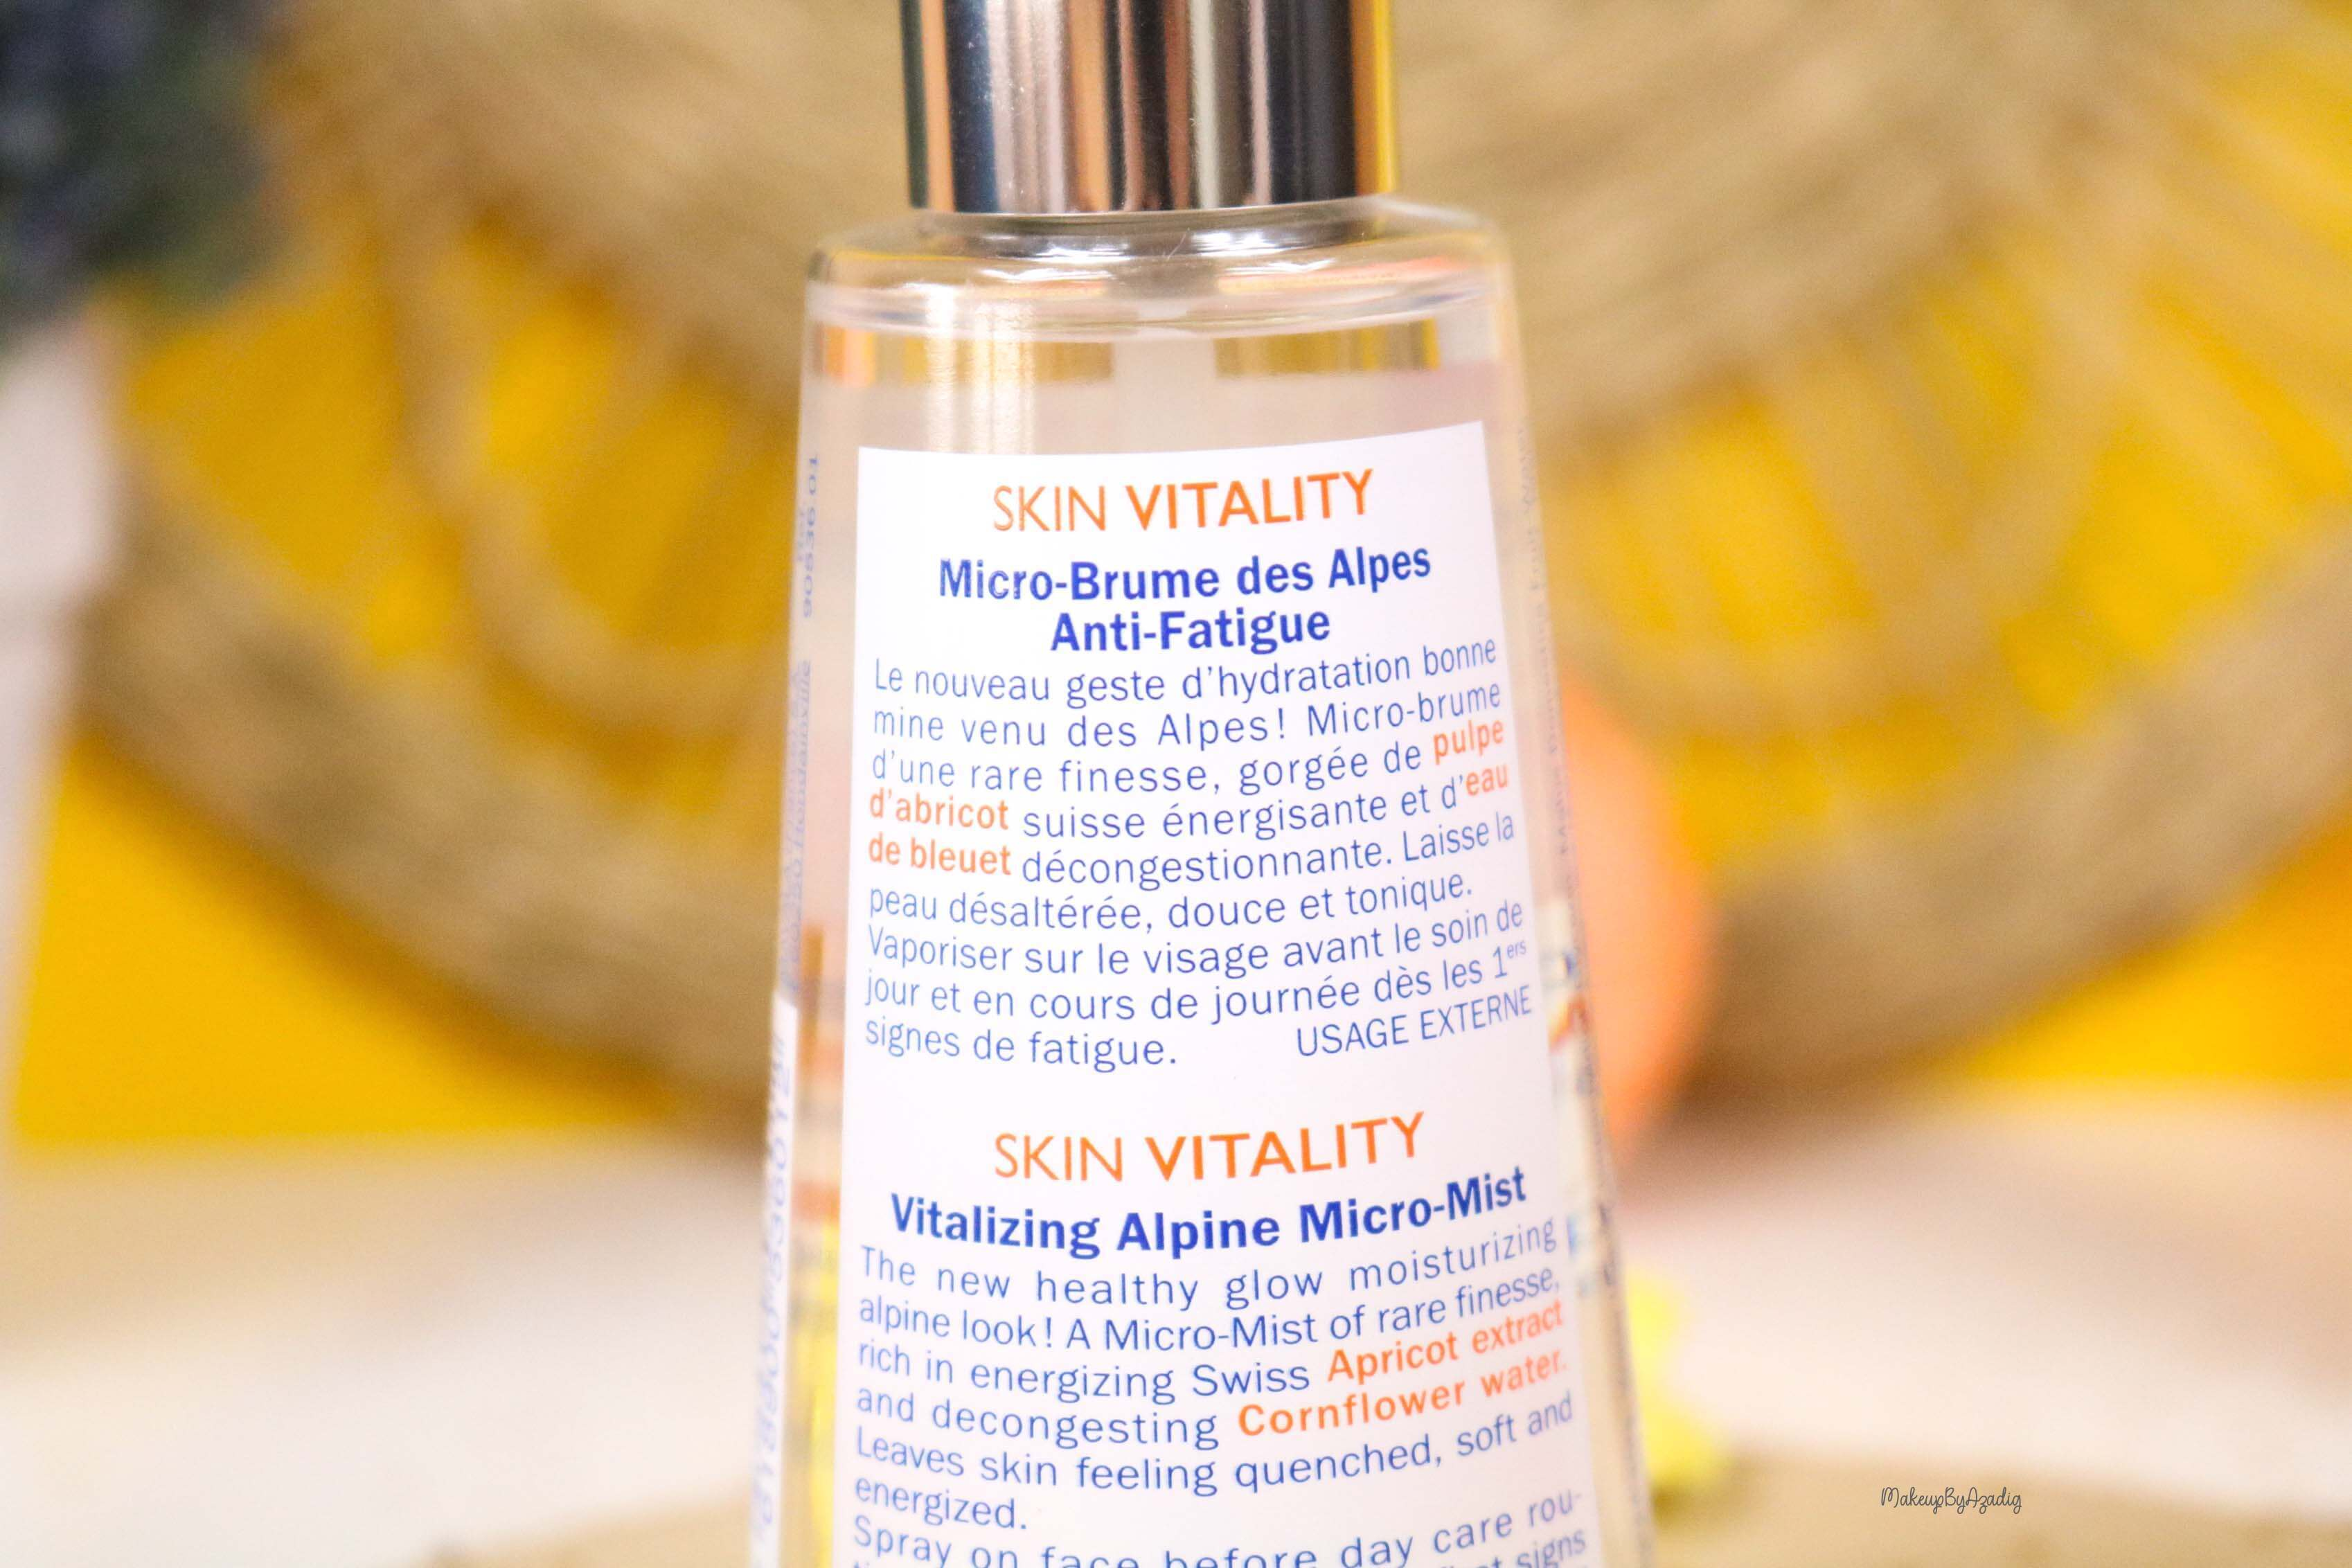 revue-routine-soin-bio-efficace-peau-sensible-skin-vitality-mavala-suisse-masque-nuit-serum-creme-jour-makeupbyazadig-alpes